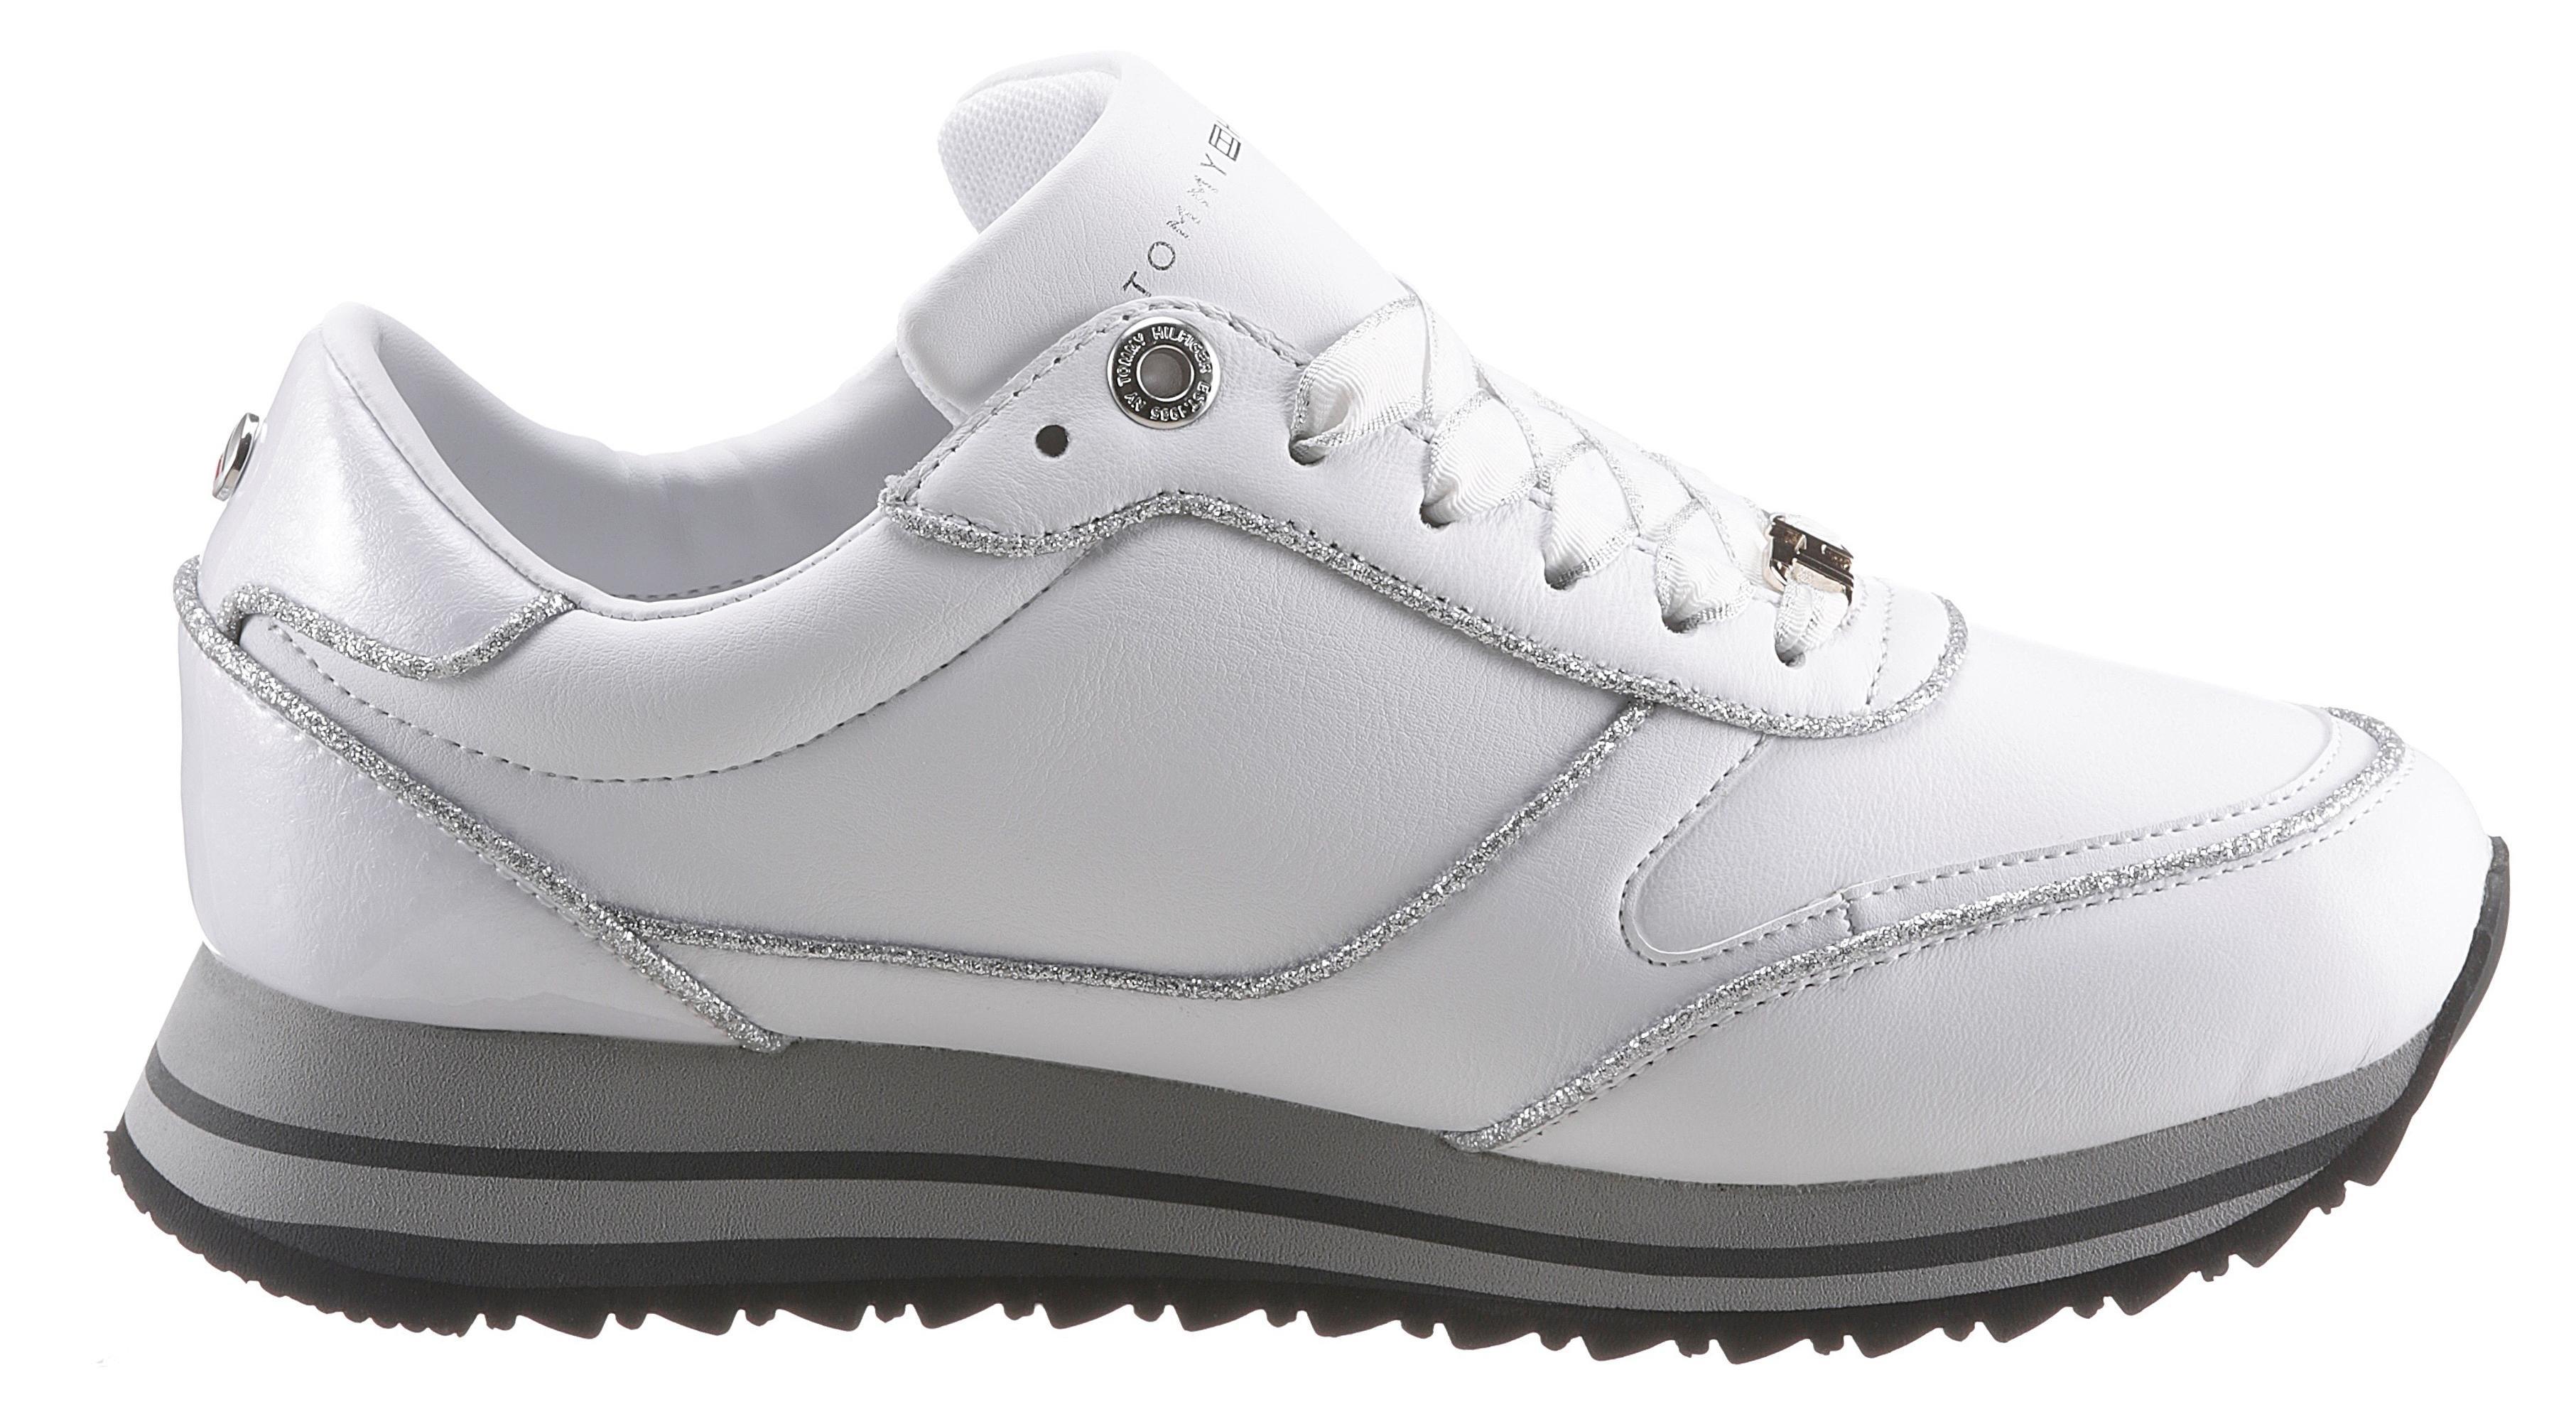 TOMMY HILFIGER sneakers met sleehak »TH GLITTER MIX RUNNER SNEAKER« goedkoop op otto.nl kopen